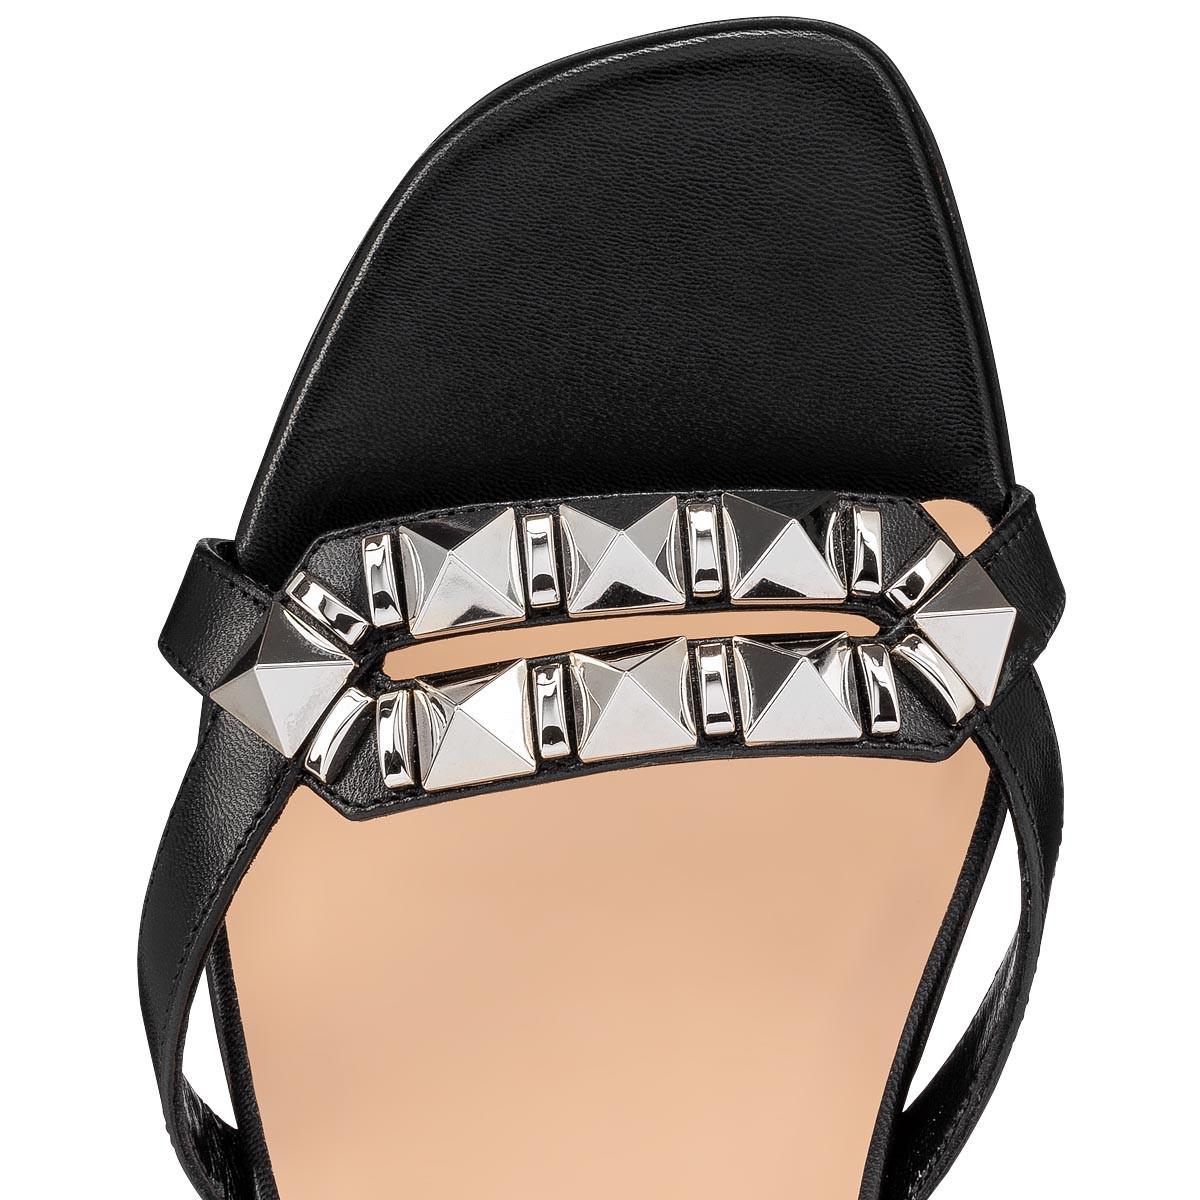 Shoes - Galerietta Flat - Christian Louboutin